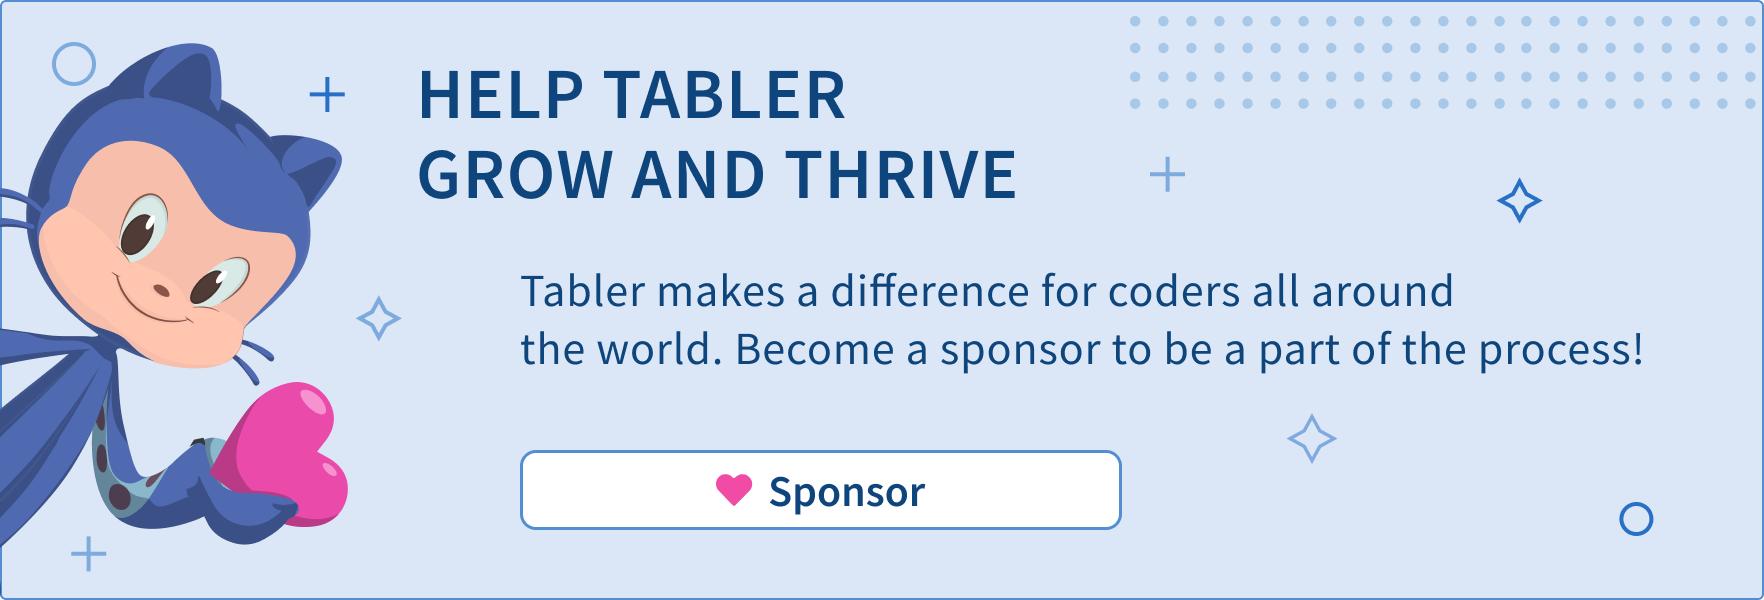 Sponsor Tabler